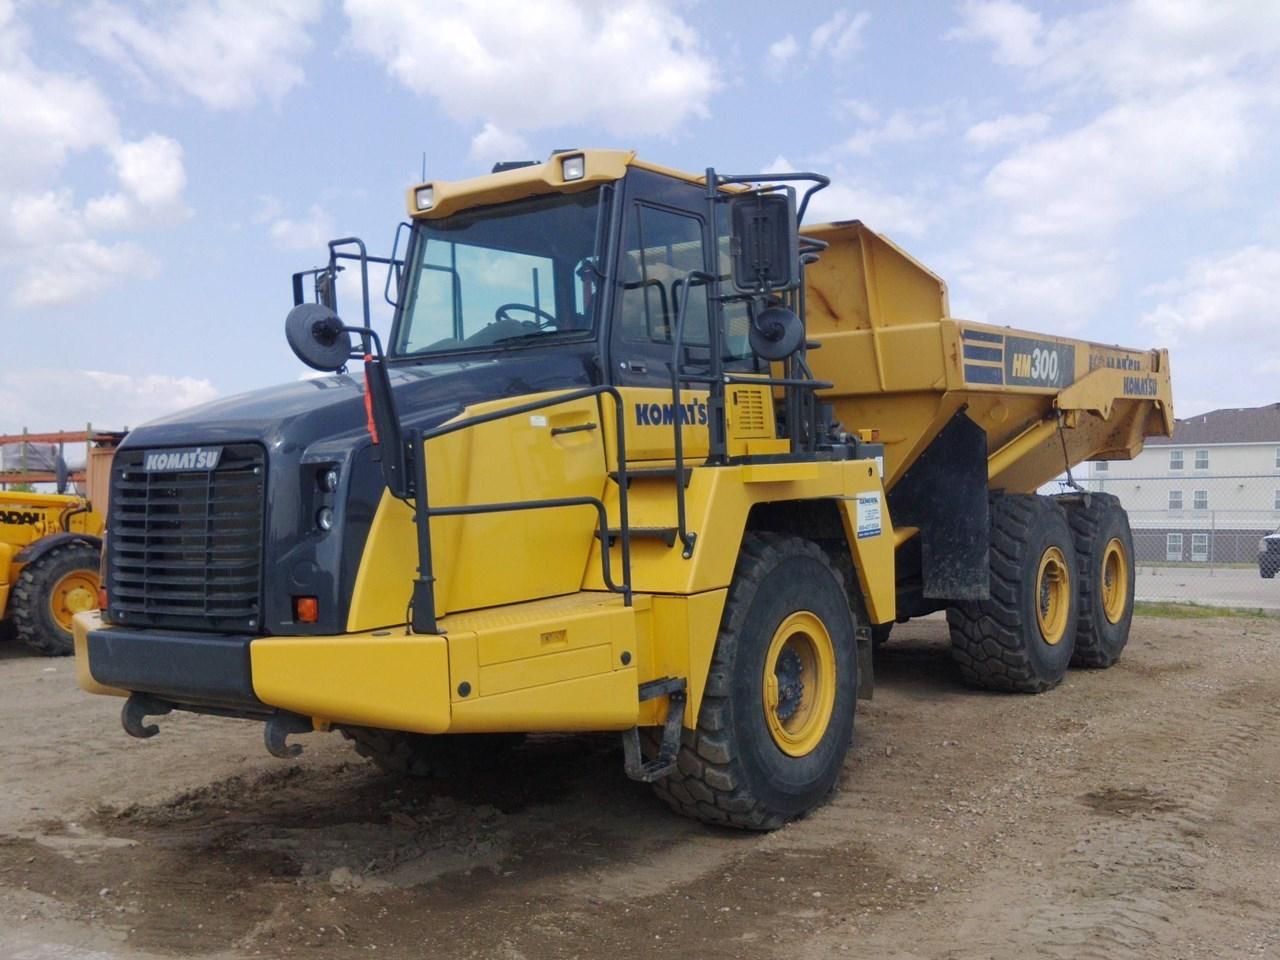 2015 Komatsu HM300-5 End Dump Truck For Sale